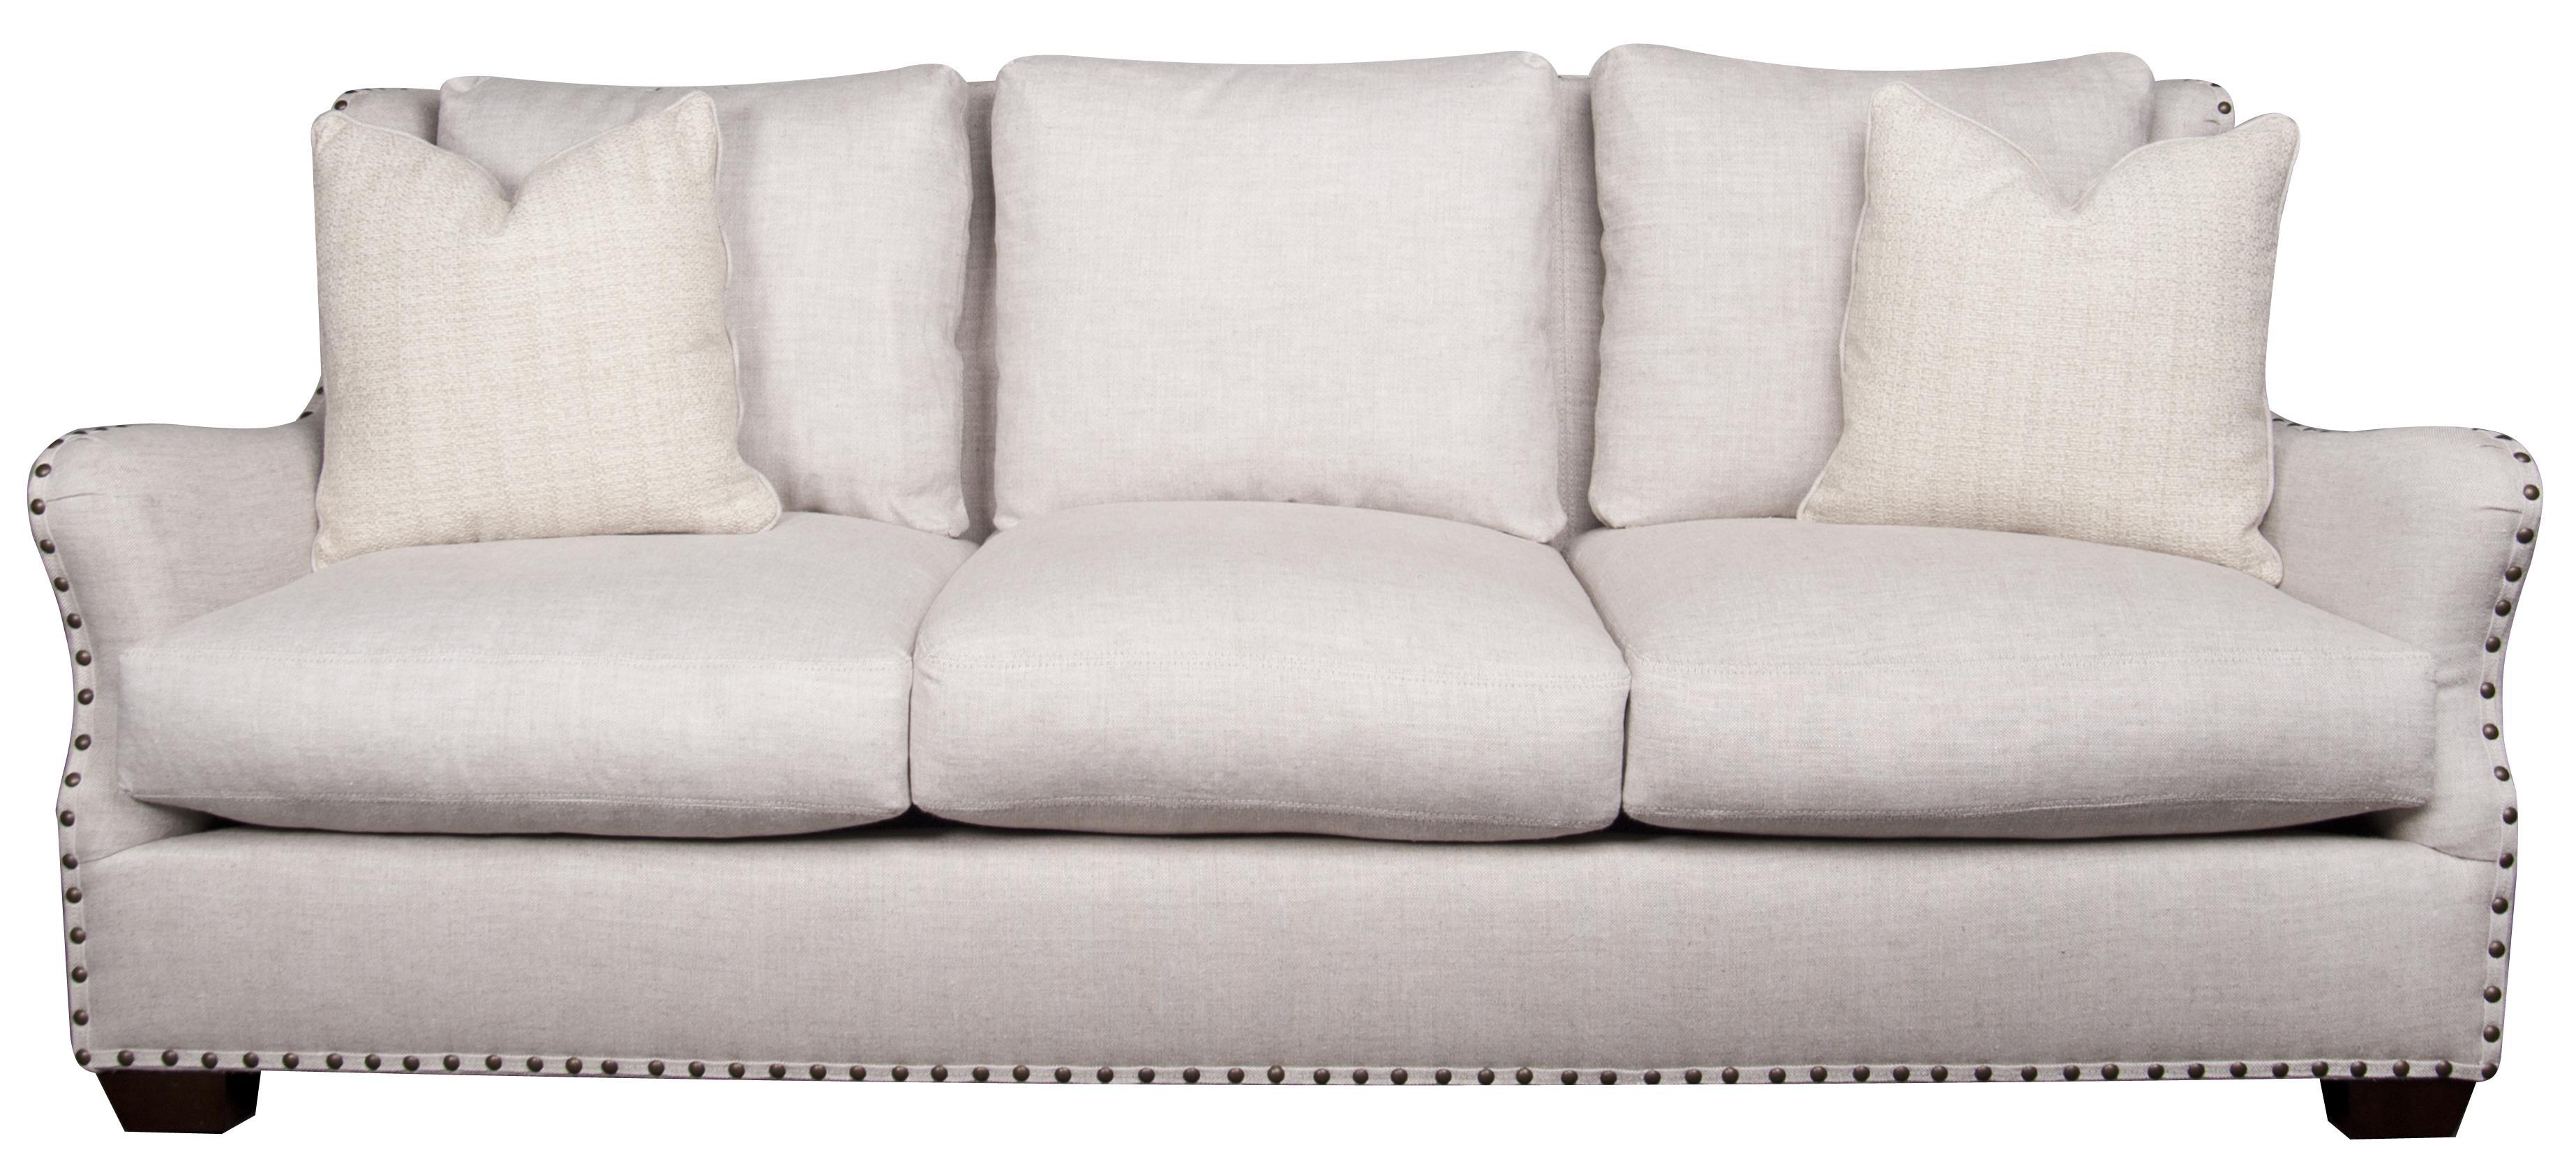 Morris Home Furnishings Sylvia Sylvia Sofa - Item Number: 307282116